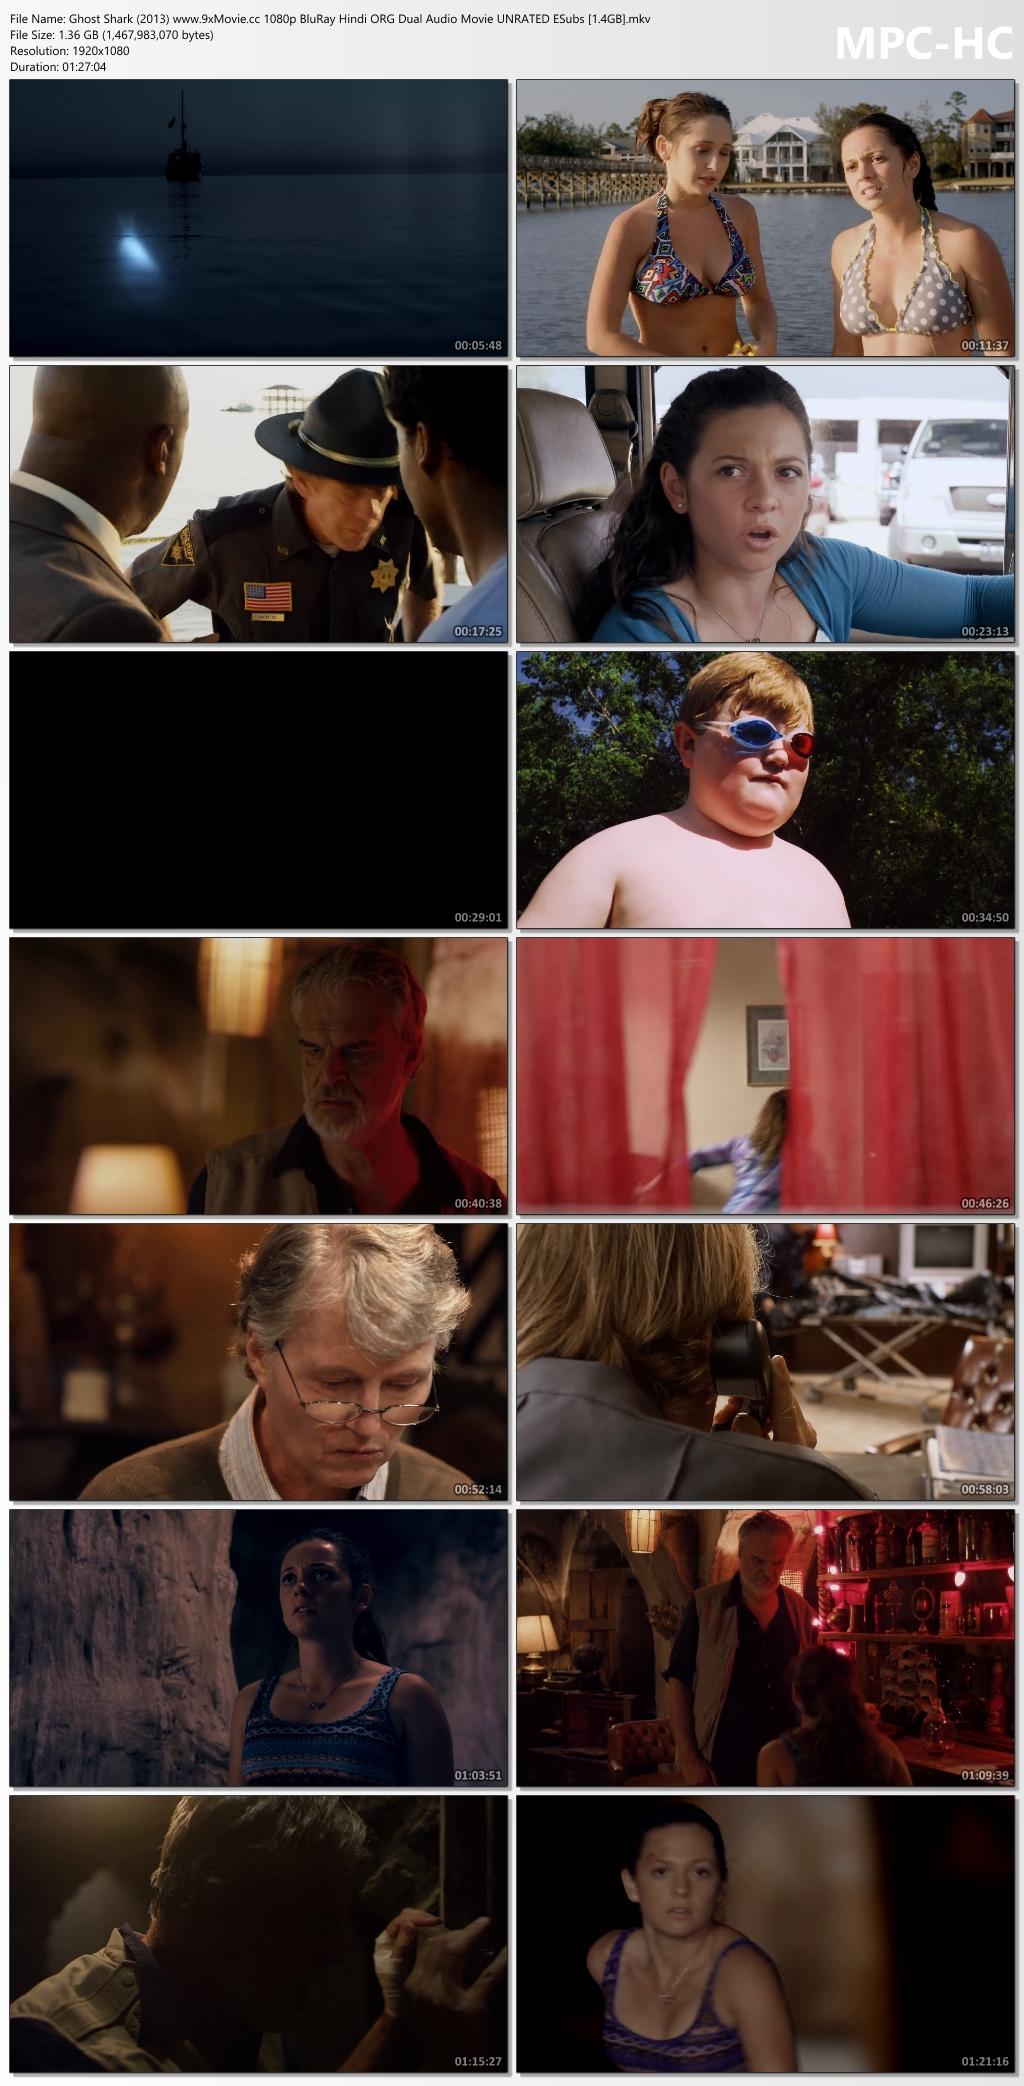 Ghost-Shark-2013-www-9x-Movie-cc-1080p-Blu-Ray-Hindi-ORG-Dual-Audio-Movie-UNRATED-ESubs-1-4-GB-mkv